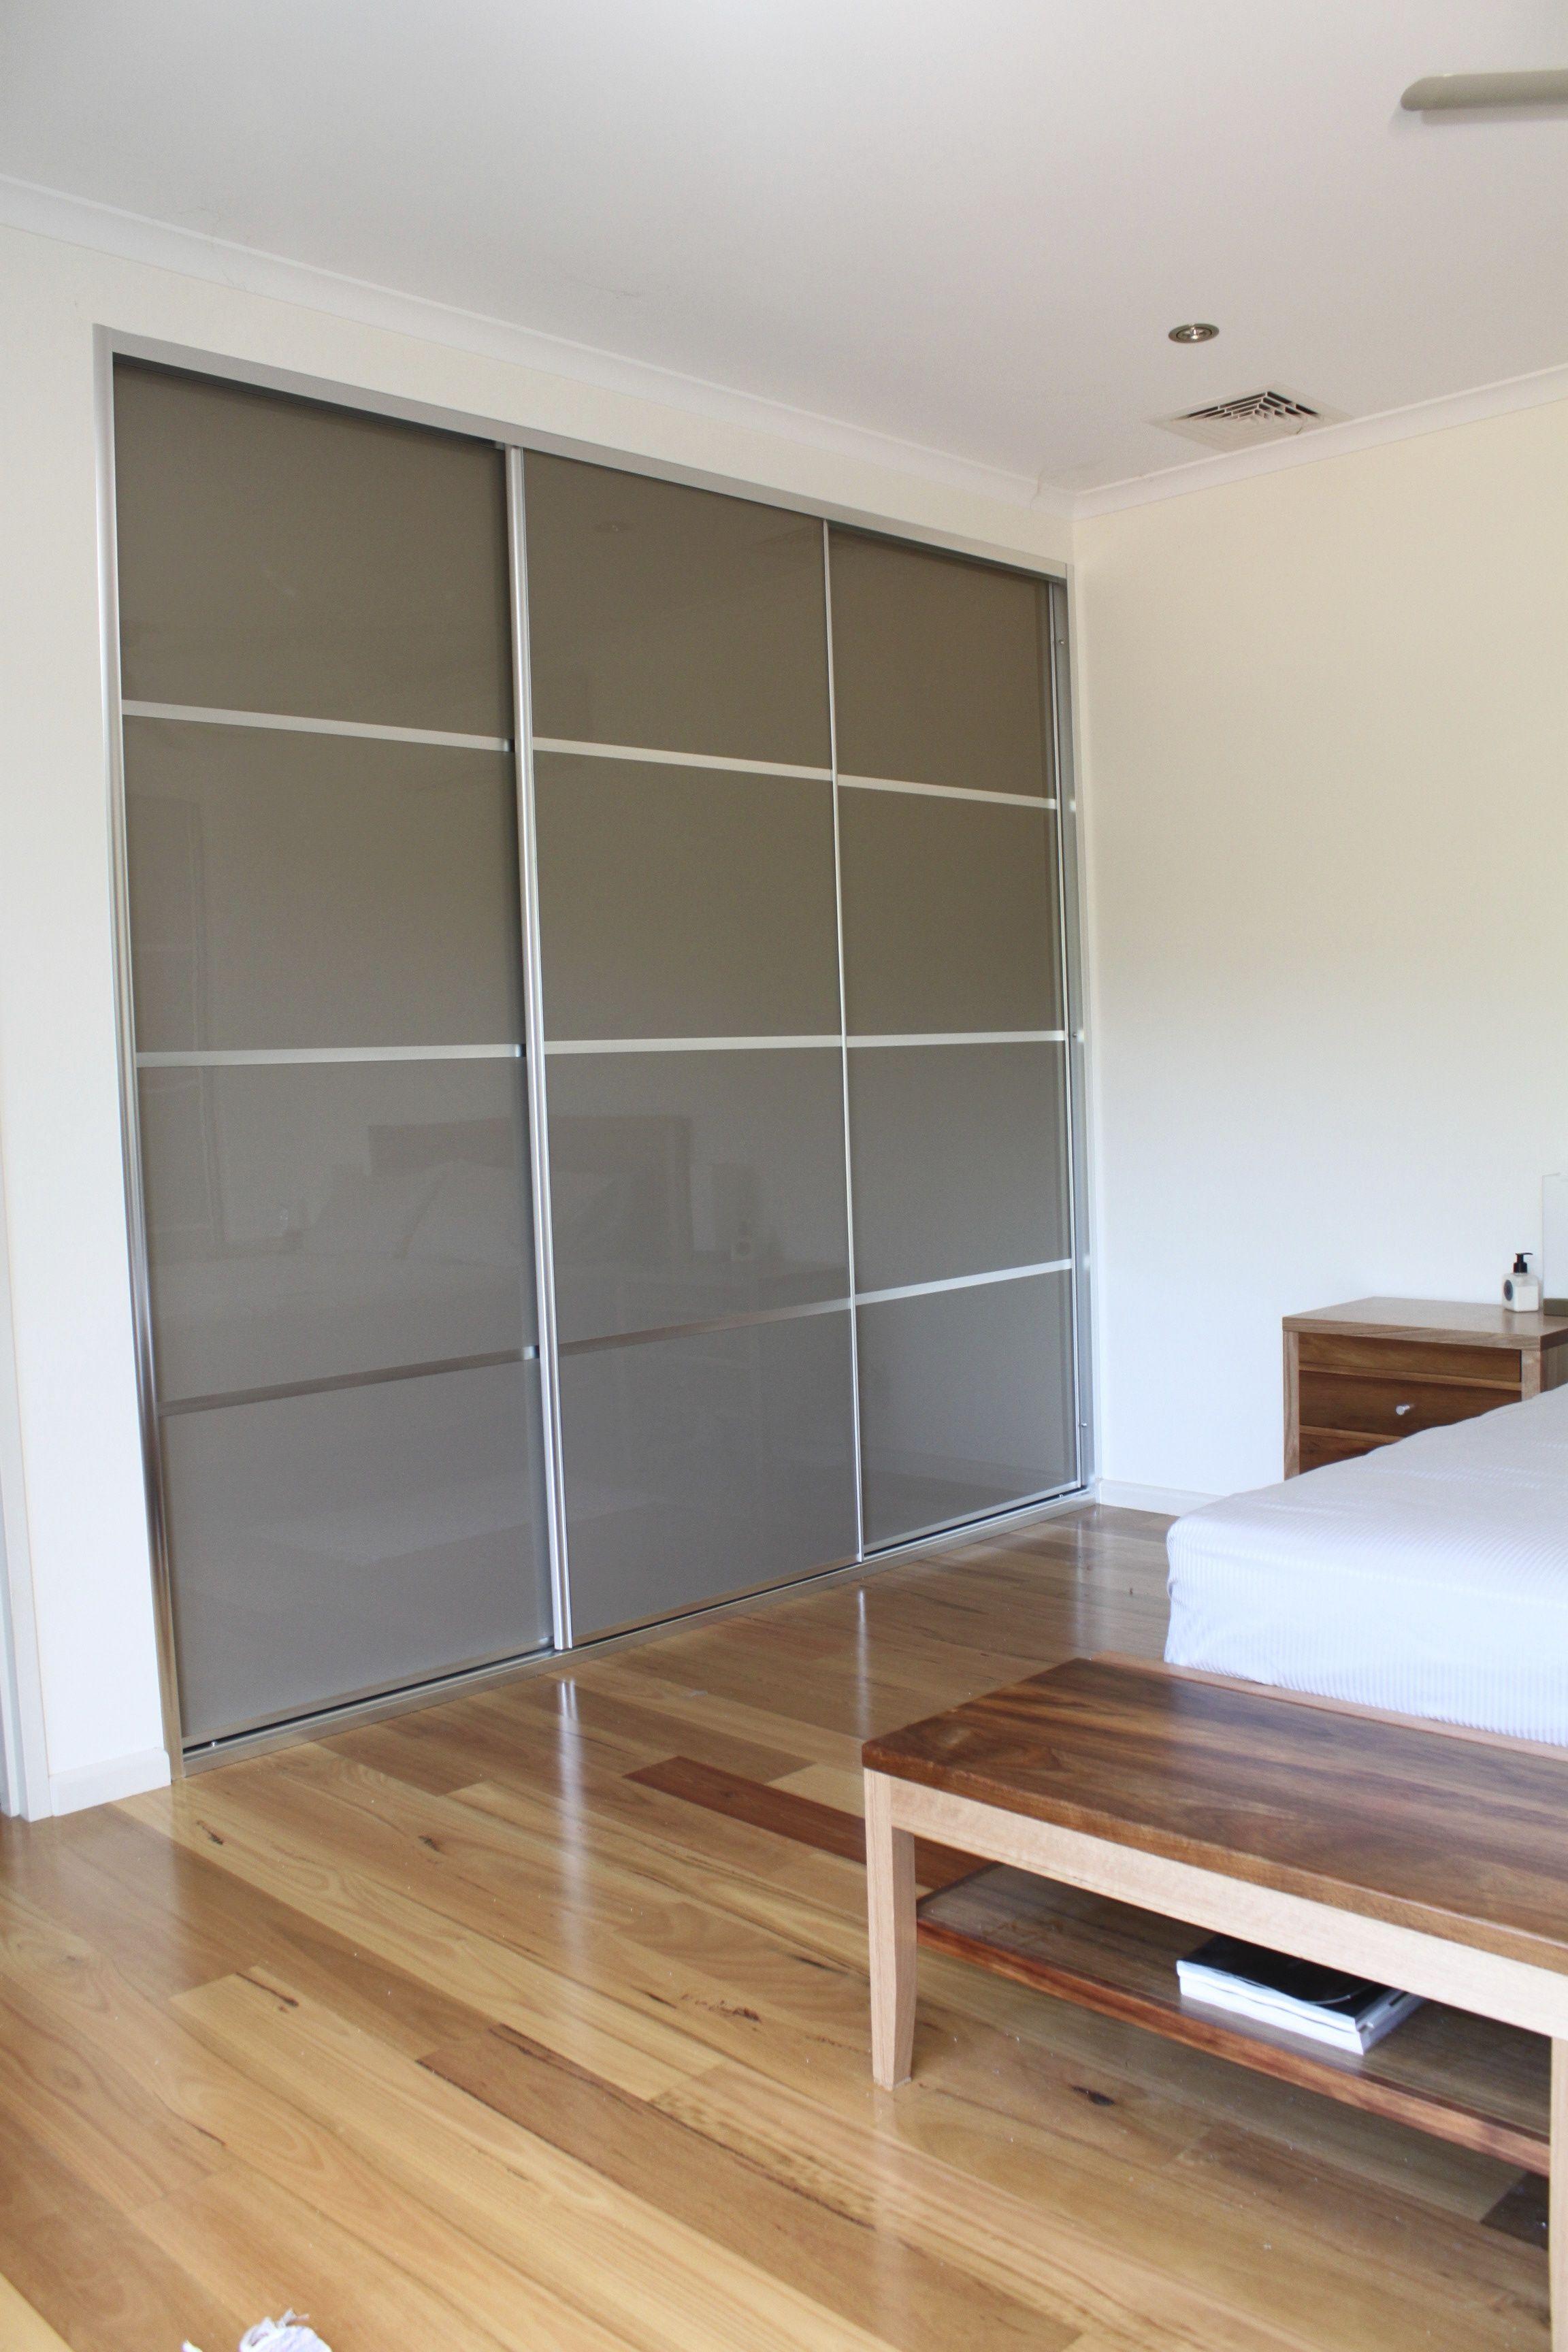 4 Panel Sliding Wardrobe Doors Using Stylite Her Side